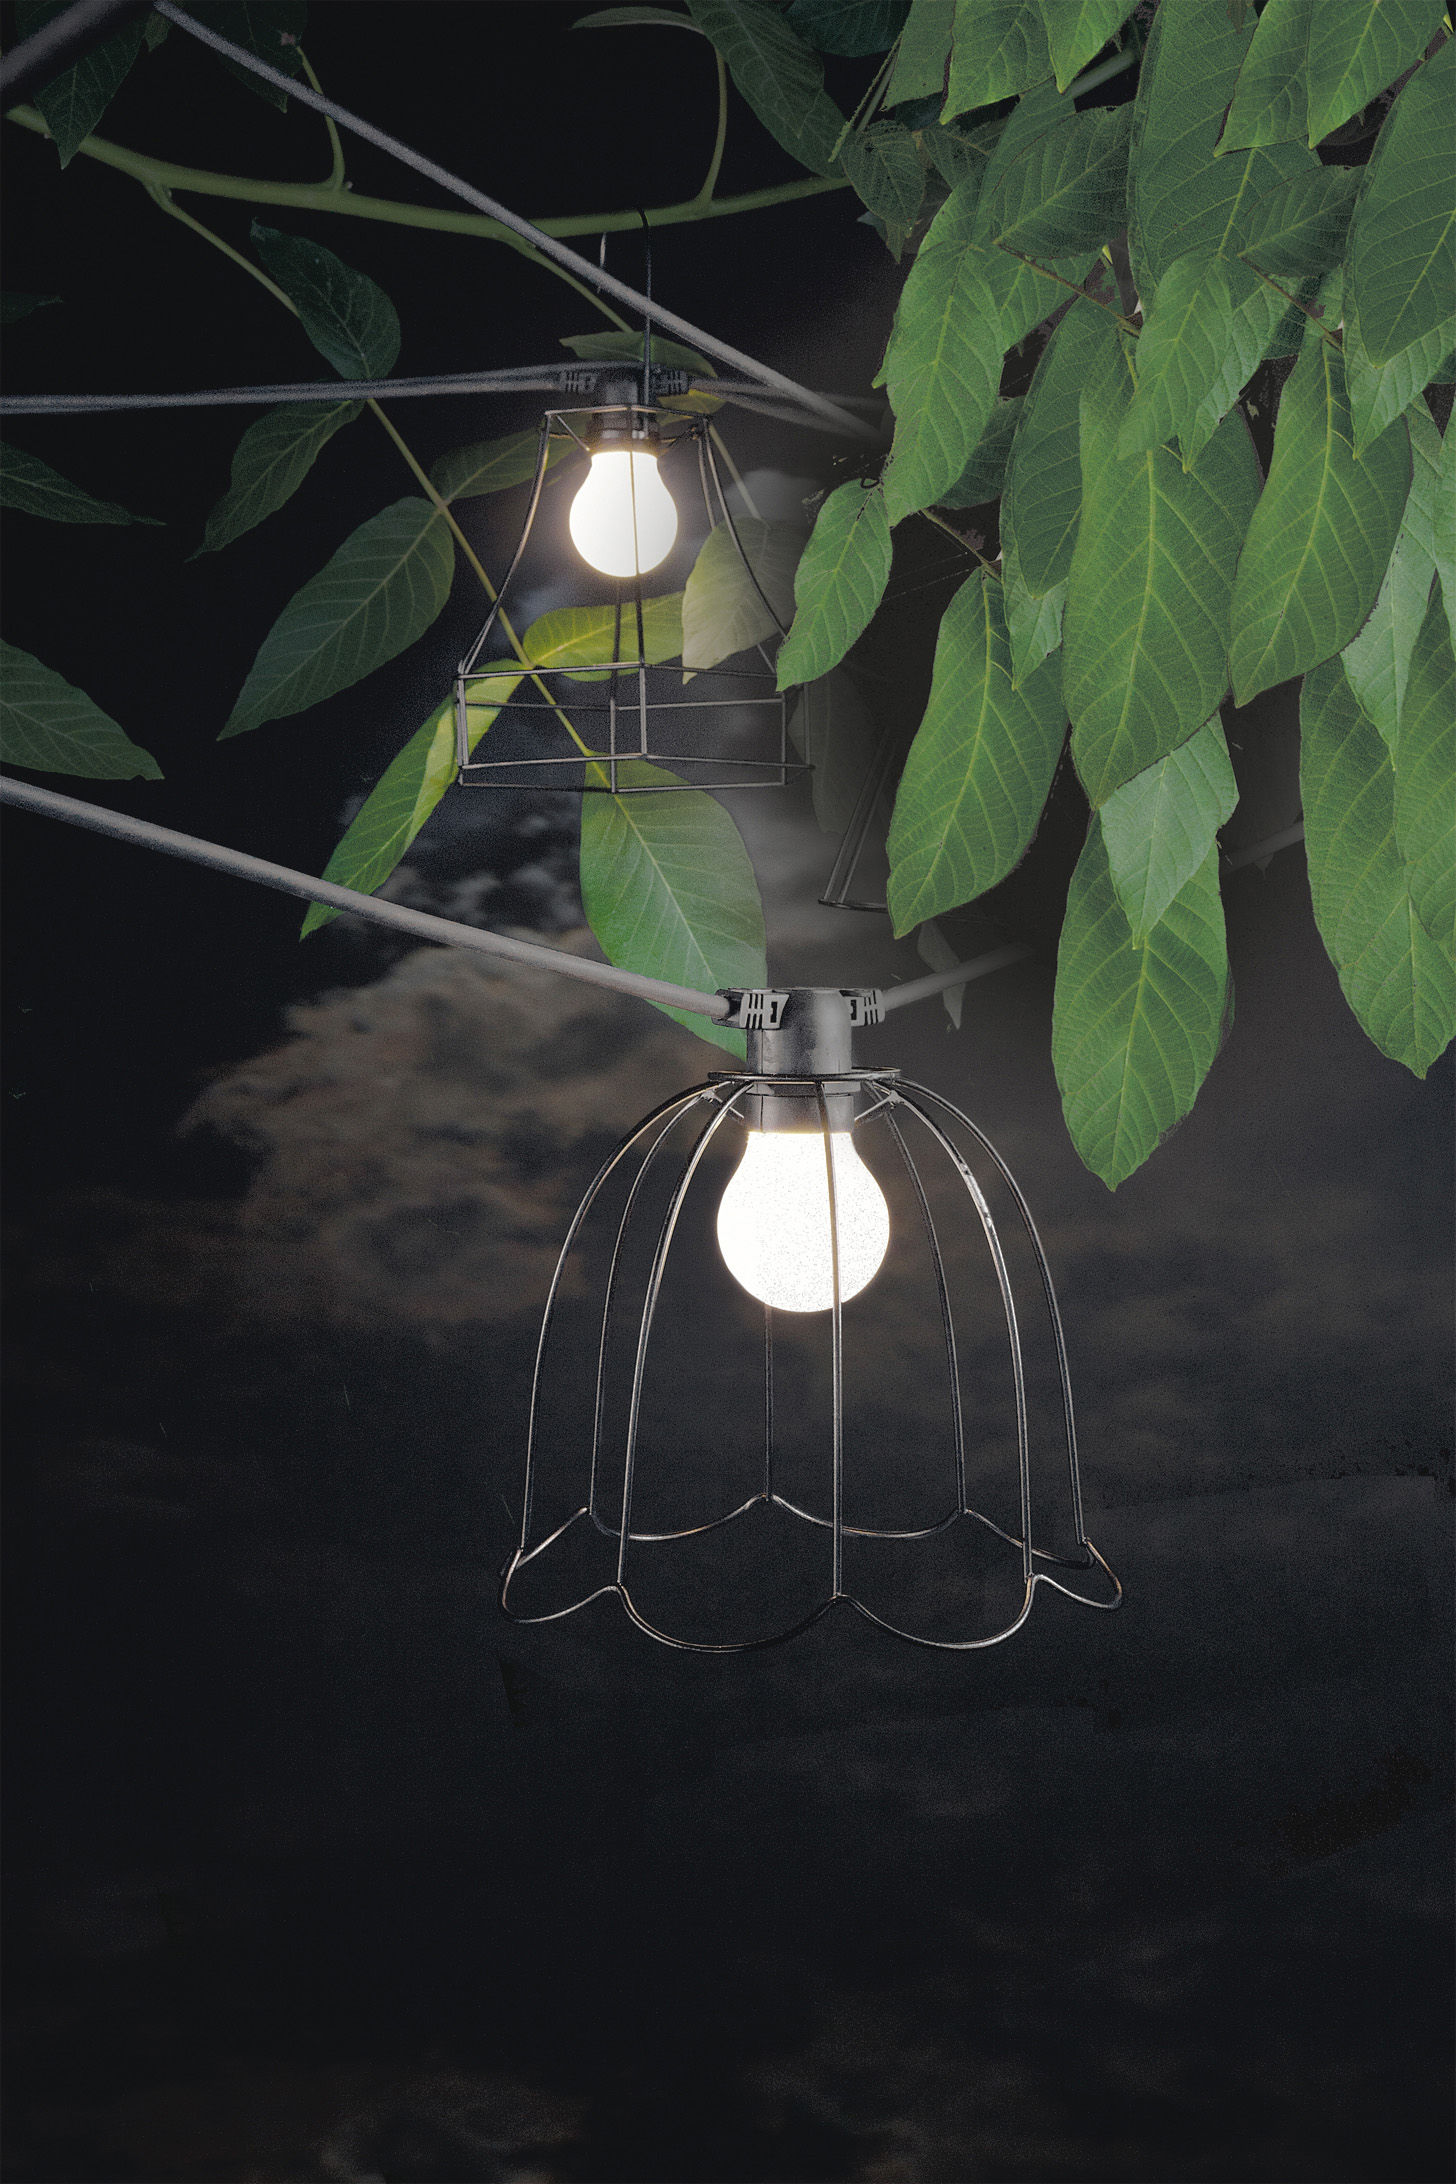 guirlande lumineuse bella vista led seletti - câble rose / ampoules